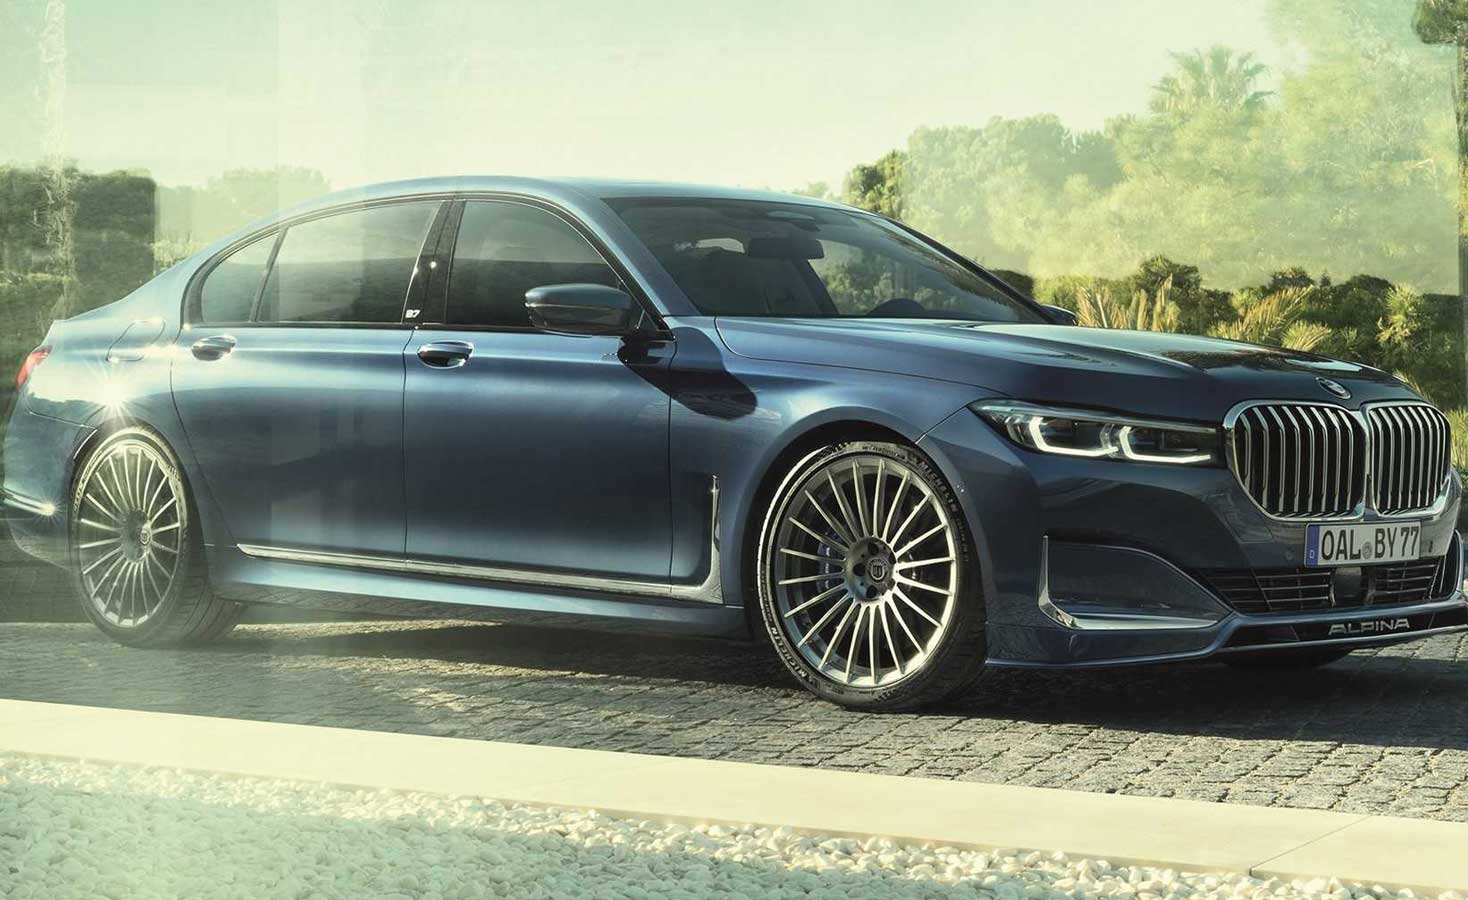 The 2019 Geneva Motor Show